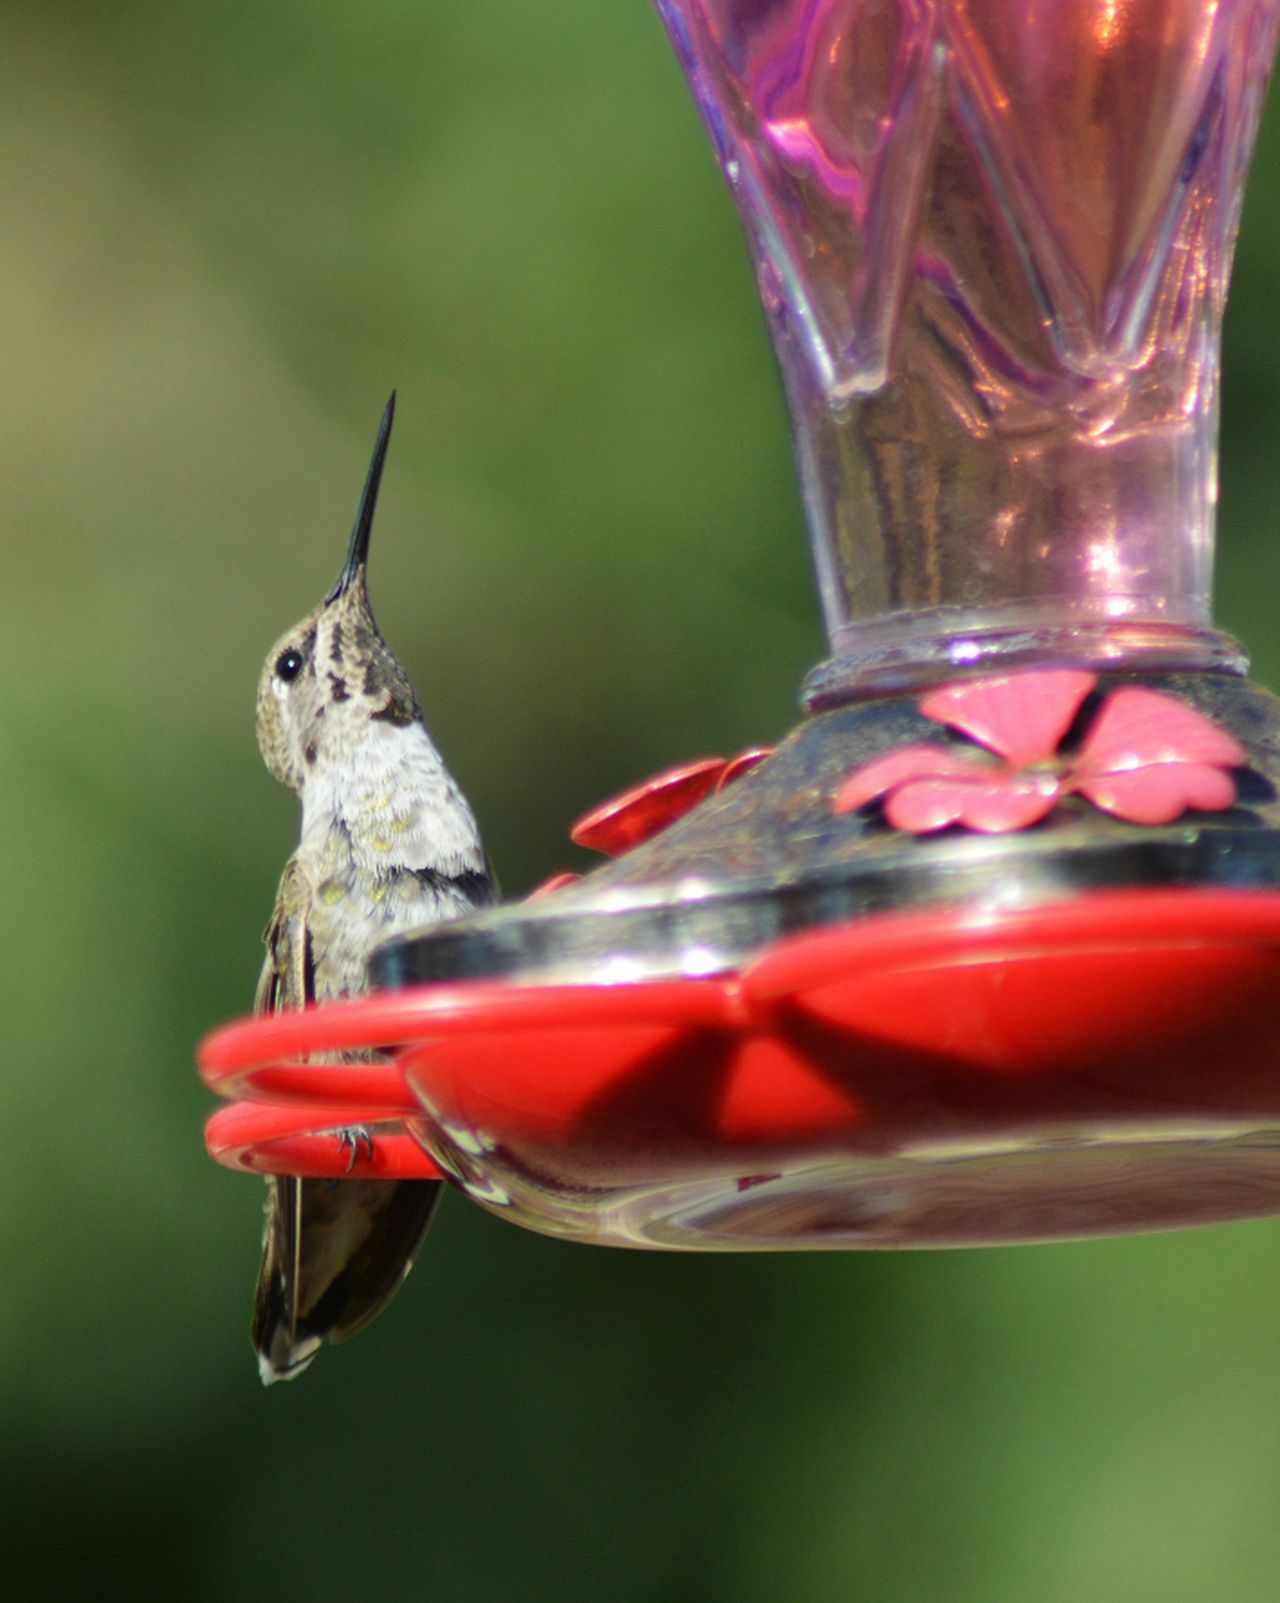 Hummingbird Looking Up Animal Wildlife Bird Bird Photography Animals In The Wild Outdoors Red Beautiful Nature Feeding